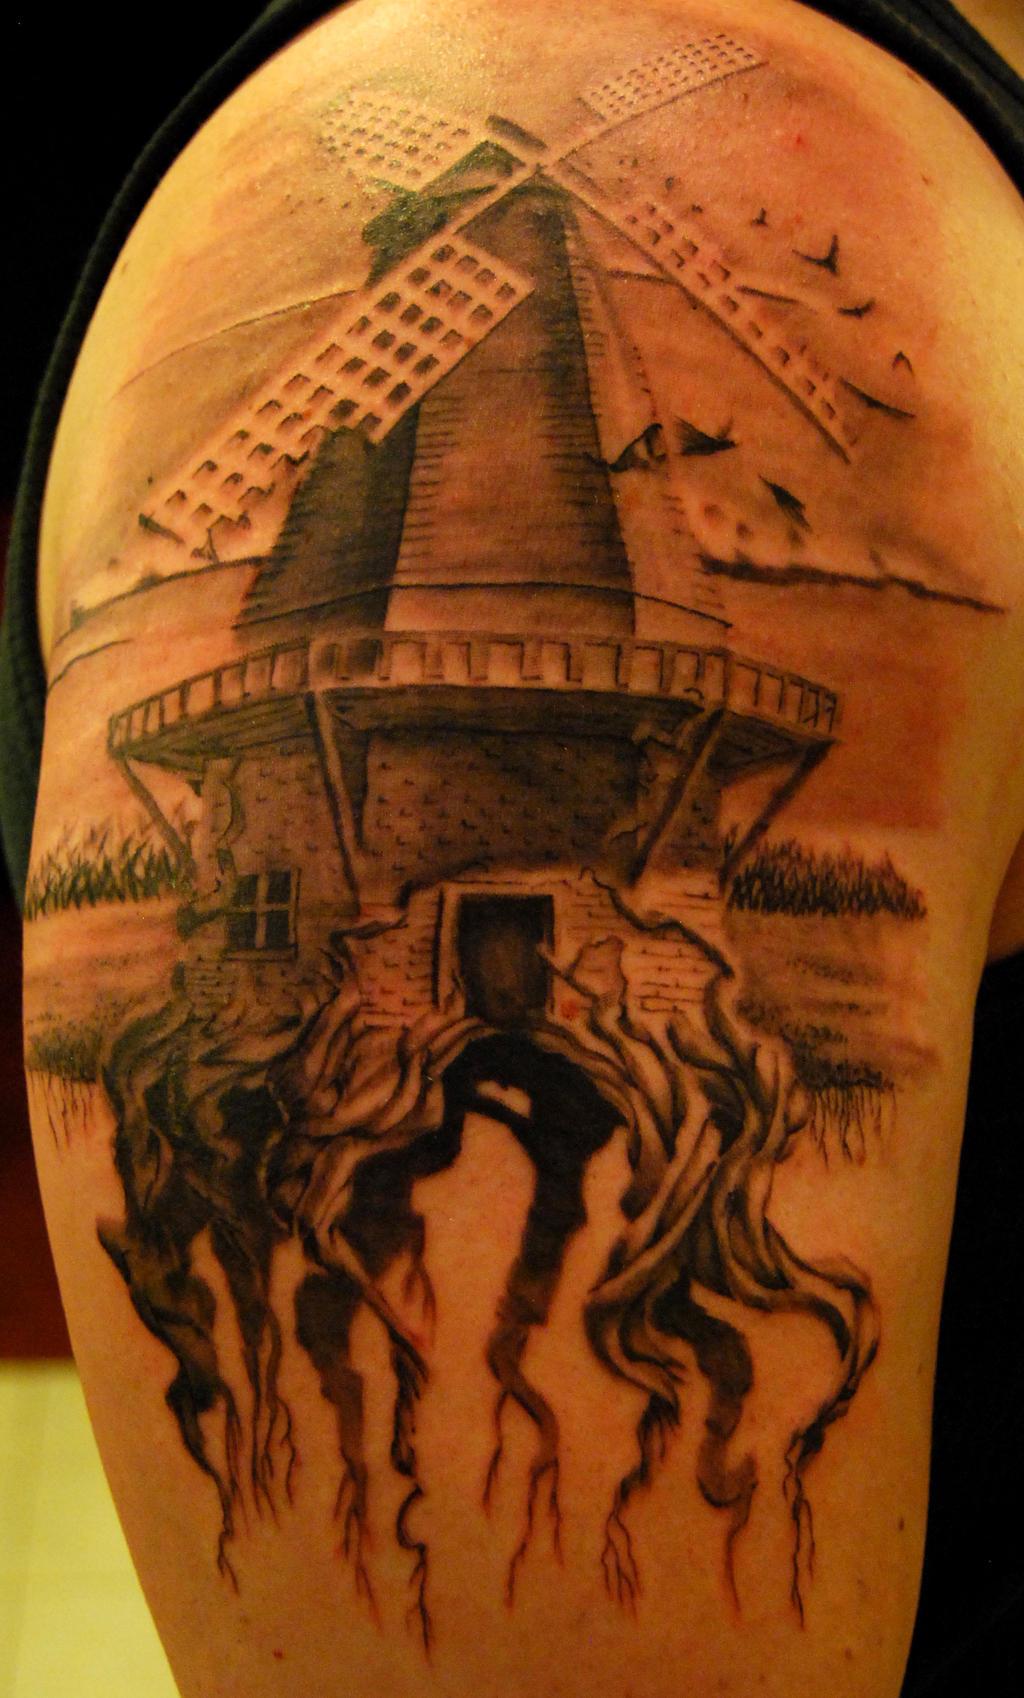 Windmill Tattoo by NateTheKnife